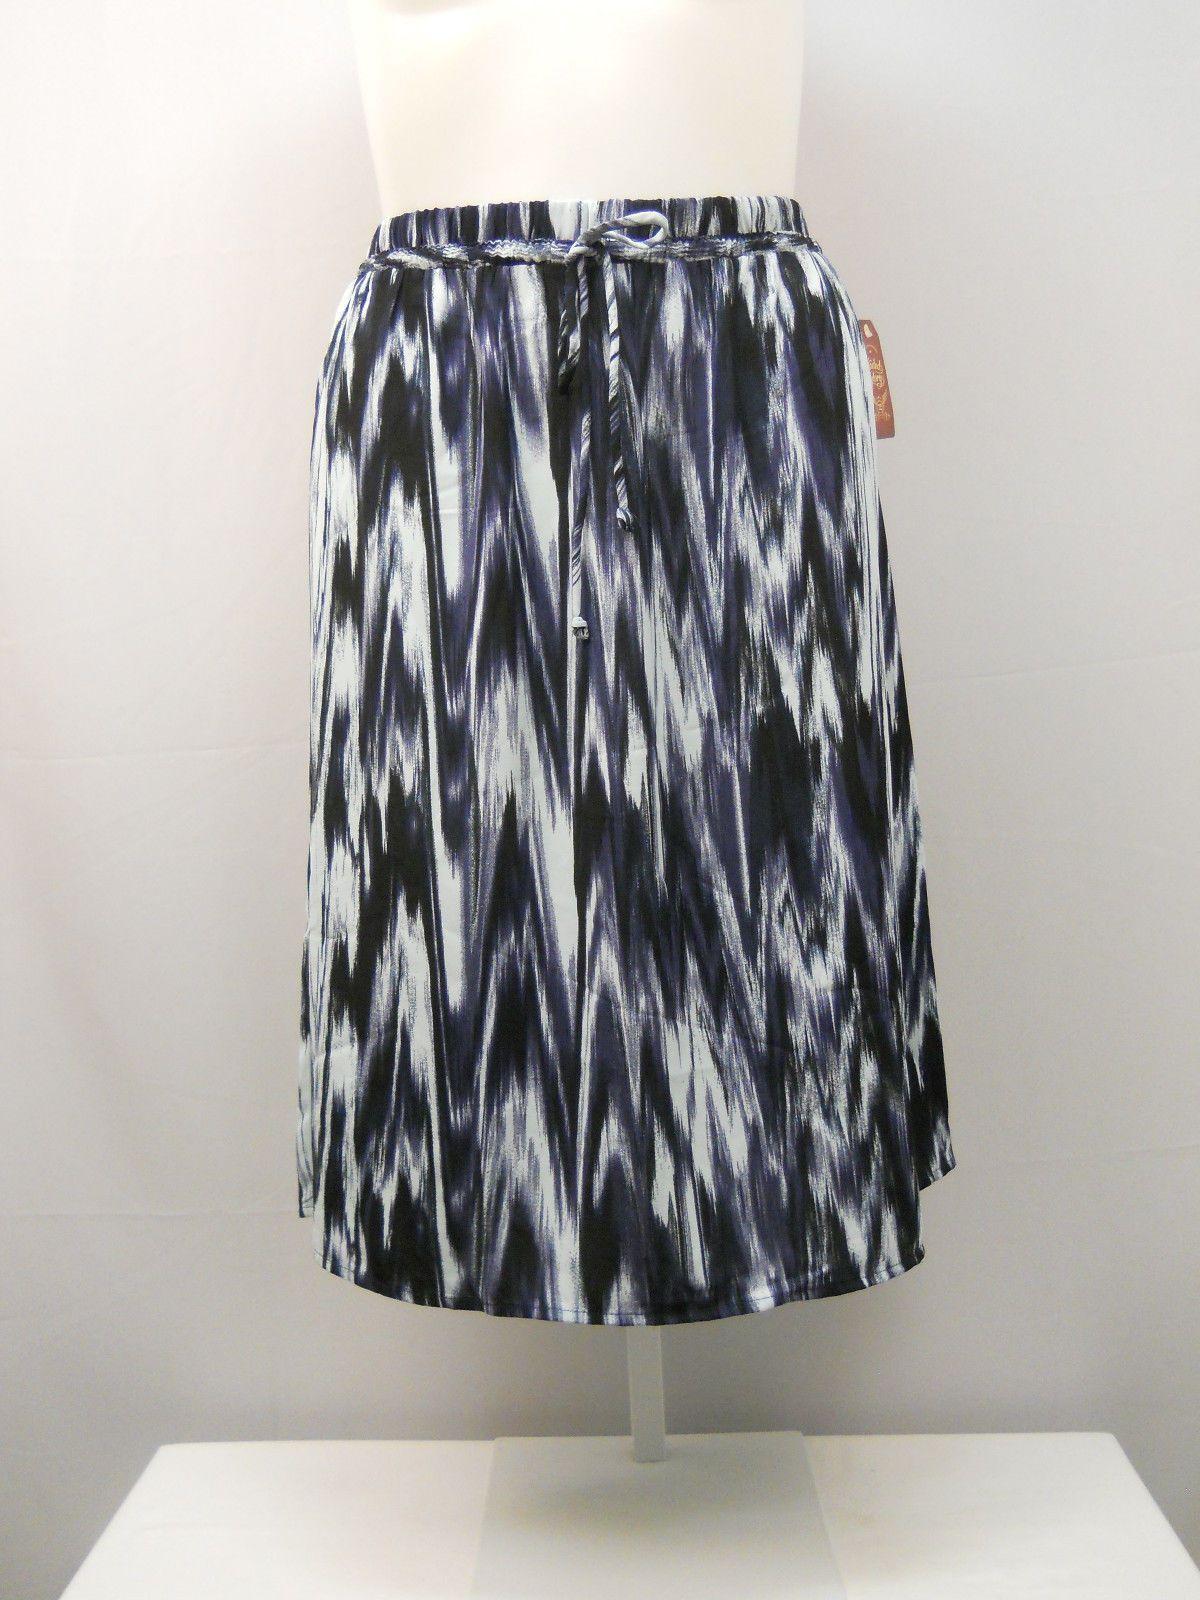 22cb298f0 Womens A-Line Skirt Size 20 FADED GLORY Geometric Navy Knee Length Elastic  Waist For Sale - Item #1628508